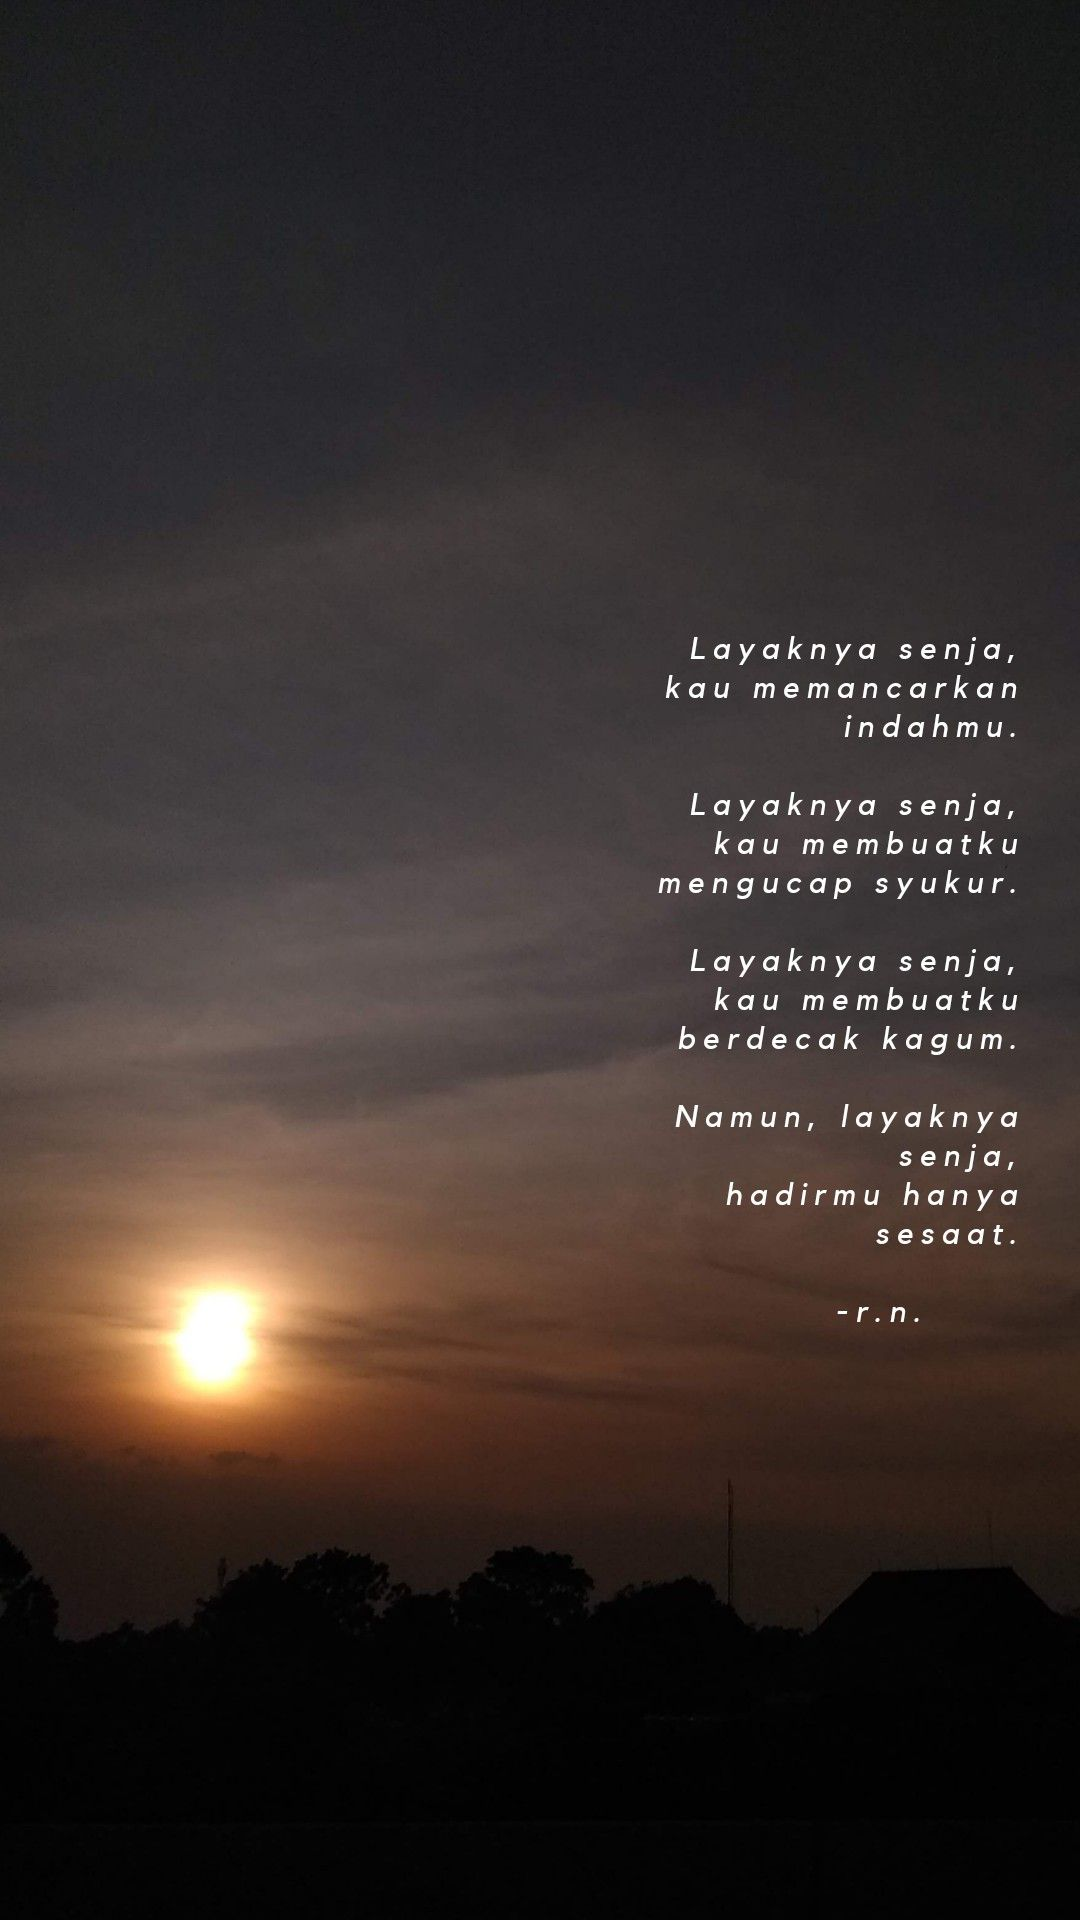 Pin Oleh Nurul Yuni Di Quotes Kutipan Jatuh Cinta Kata Kata